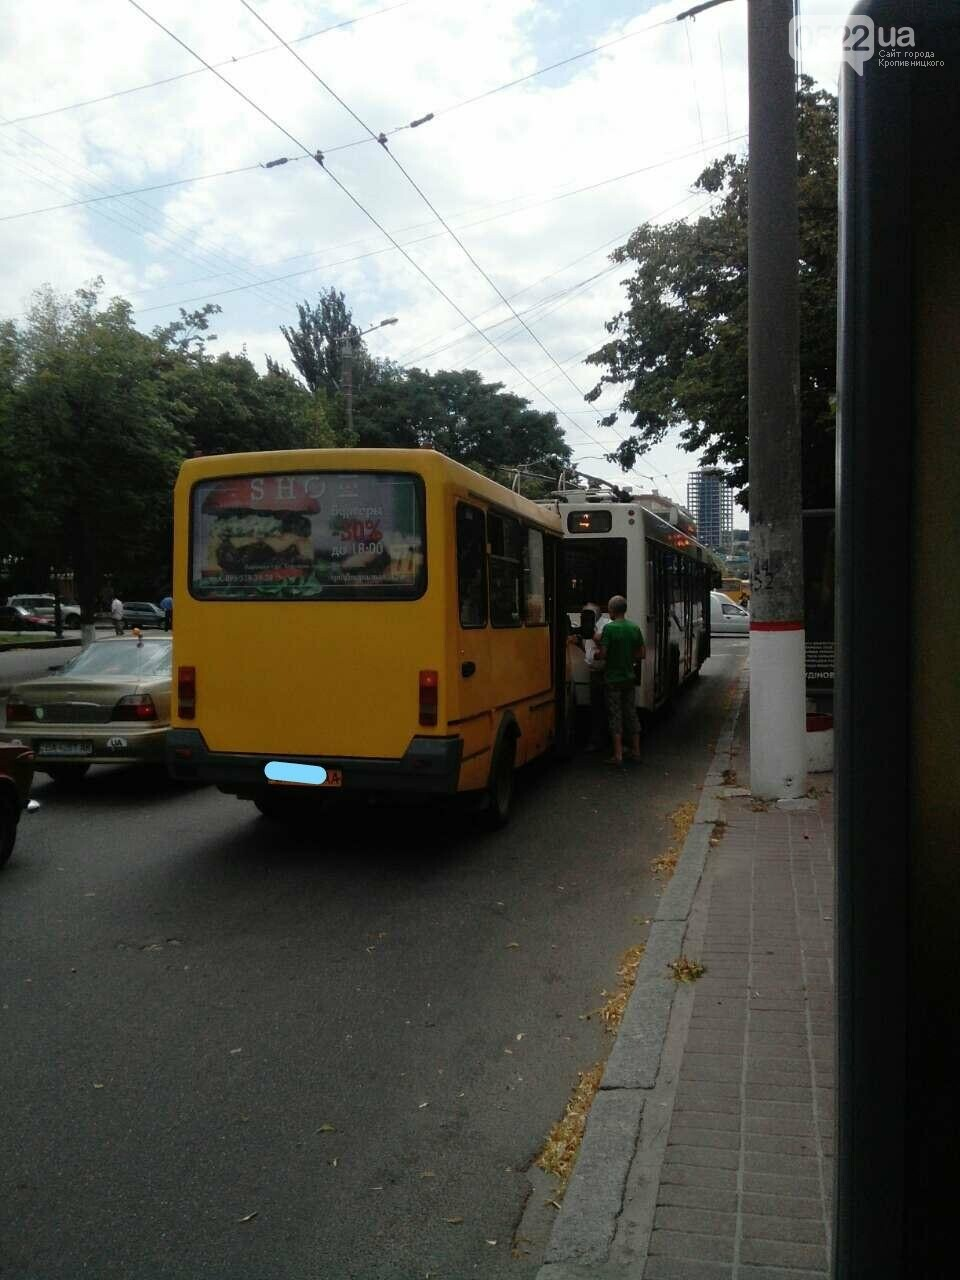 В Кропивницком маршрутка врезалась в троллейбус ФОТО, фото-1